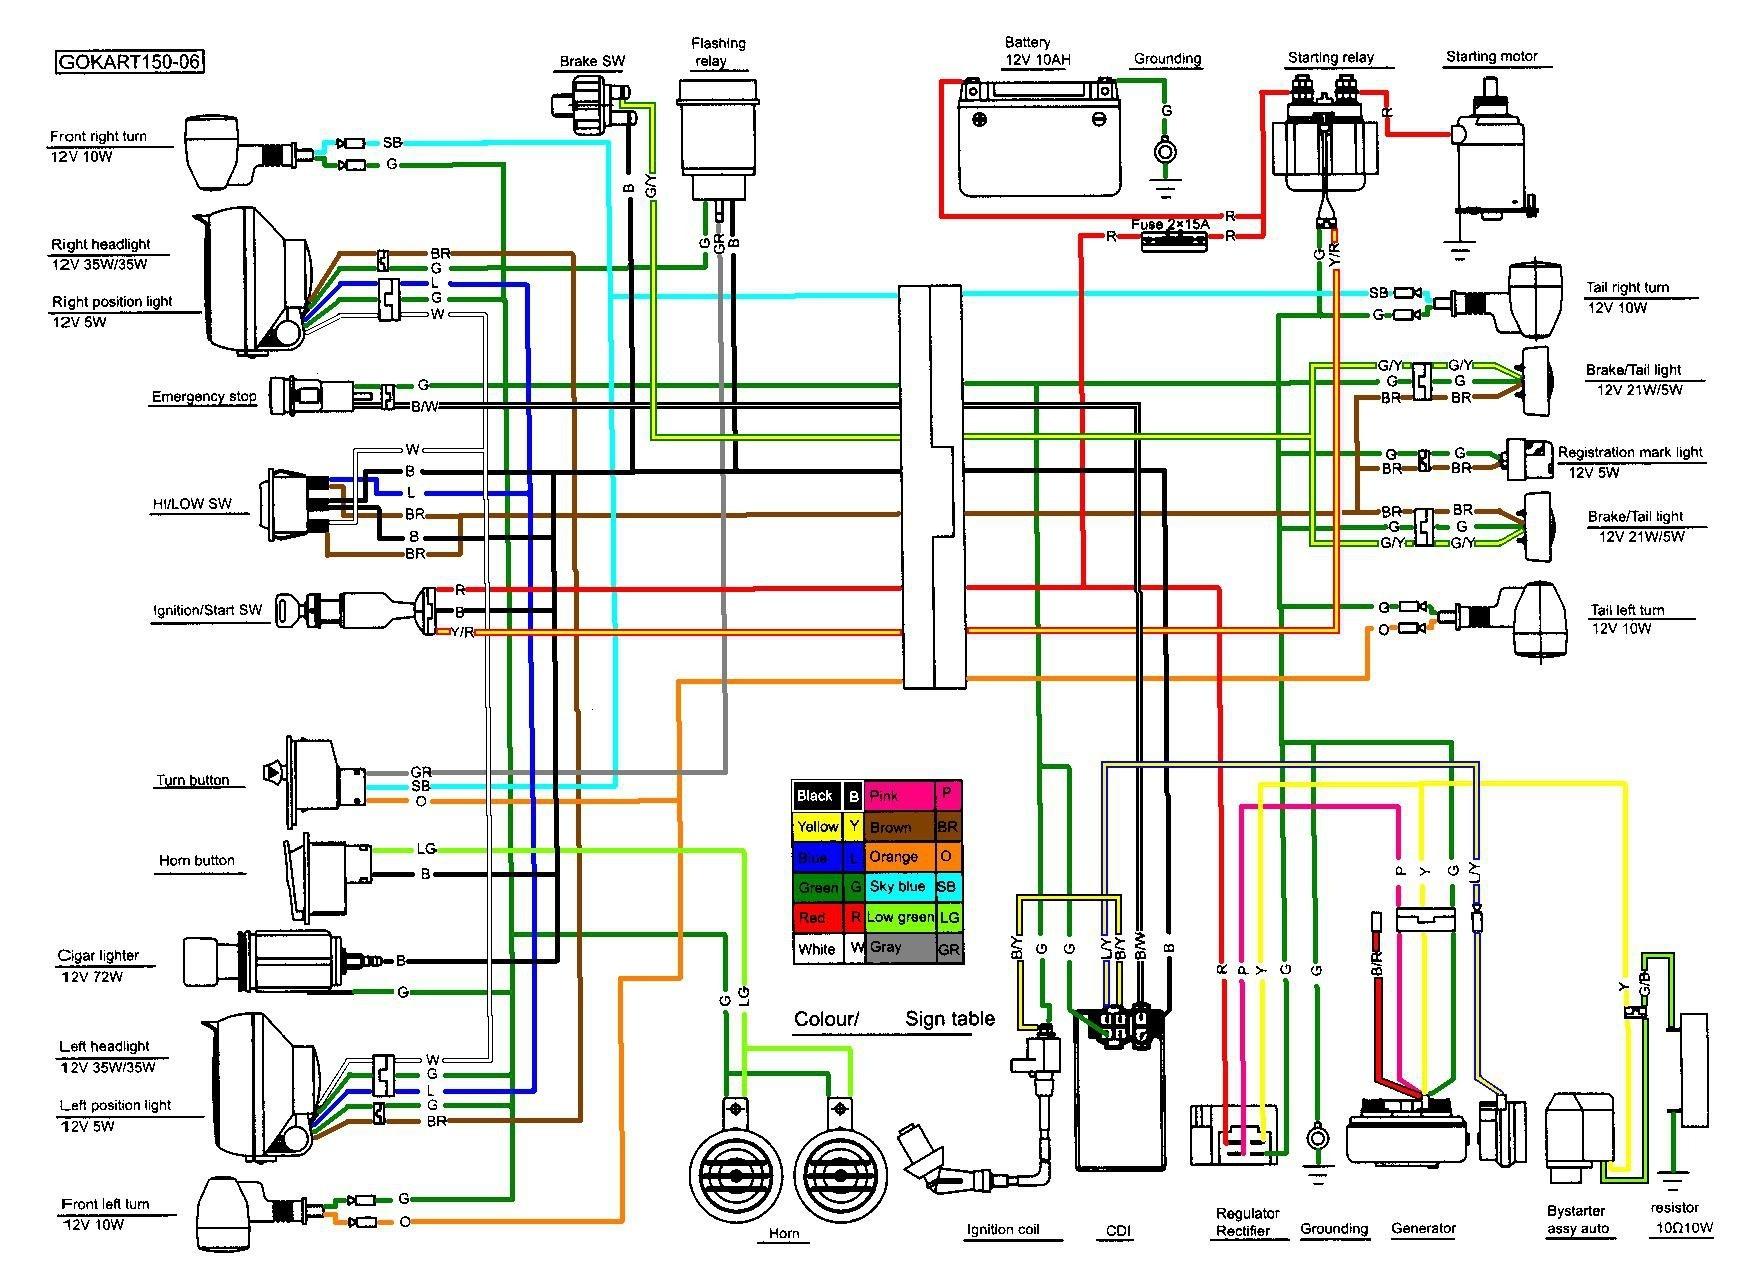 Gy6 150cc Engine Diagram Wiring Diagram for Tao Tao 150cc Detailed Schematics Diagram Of Gy6 150cc Engine Diagram